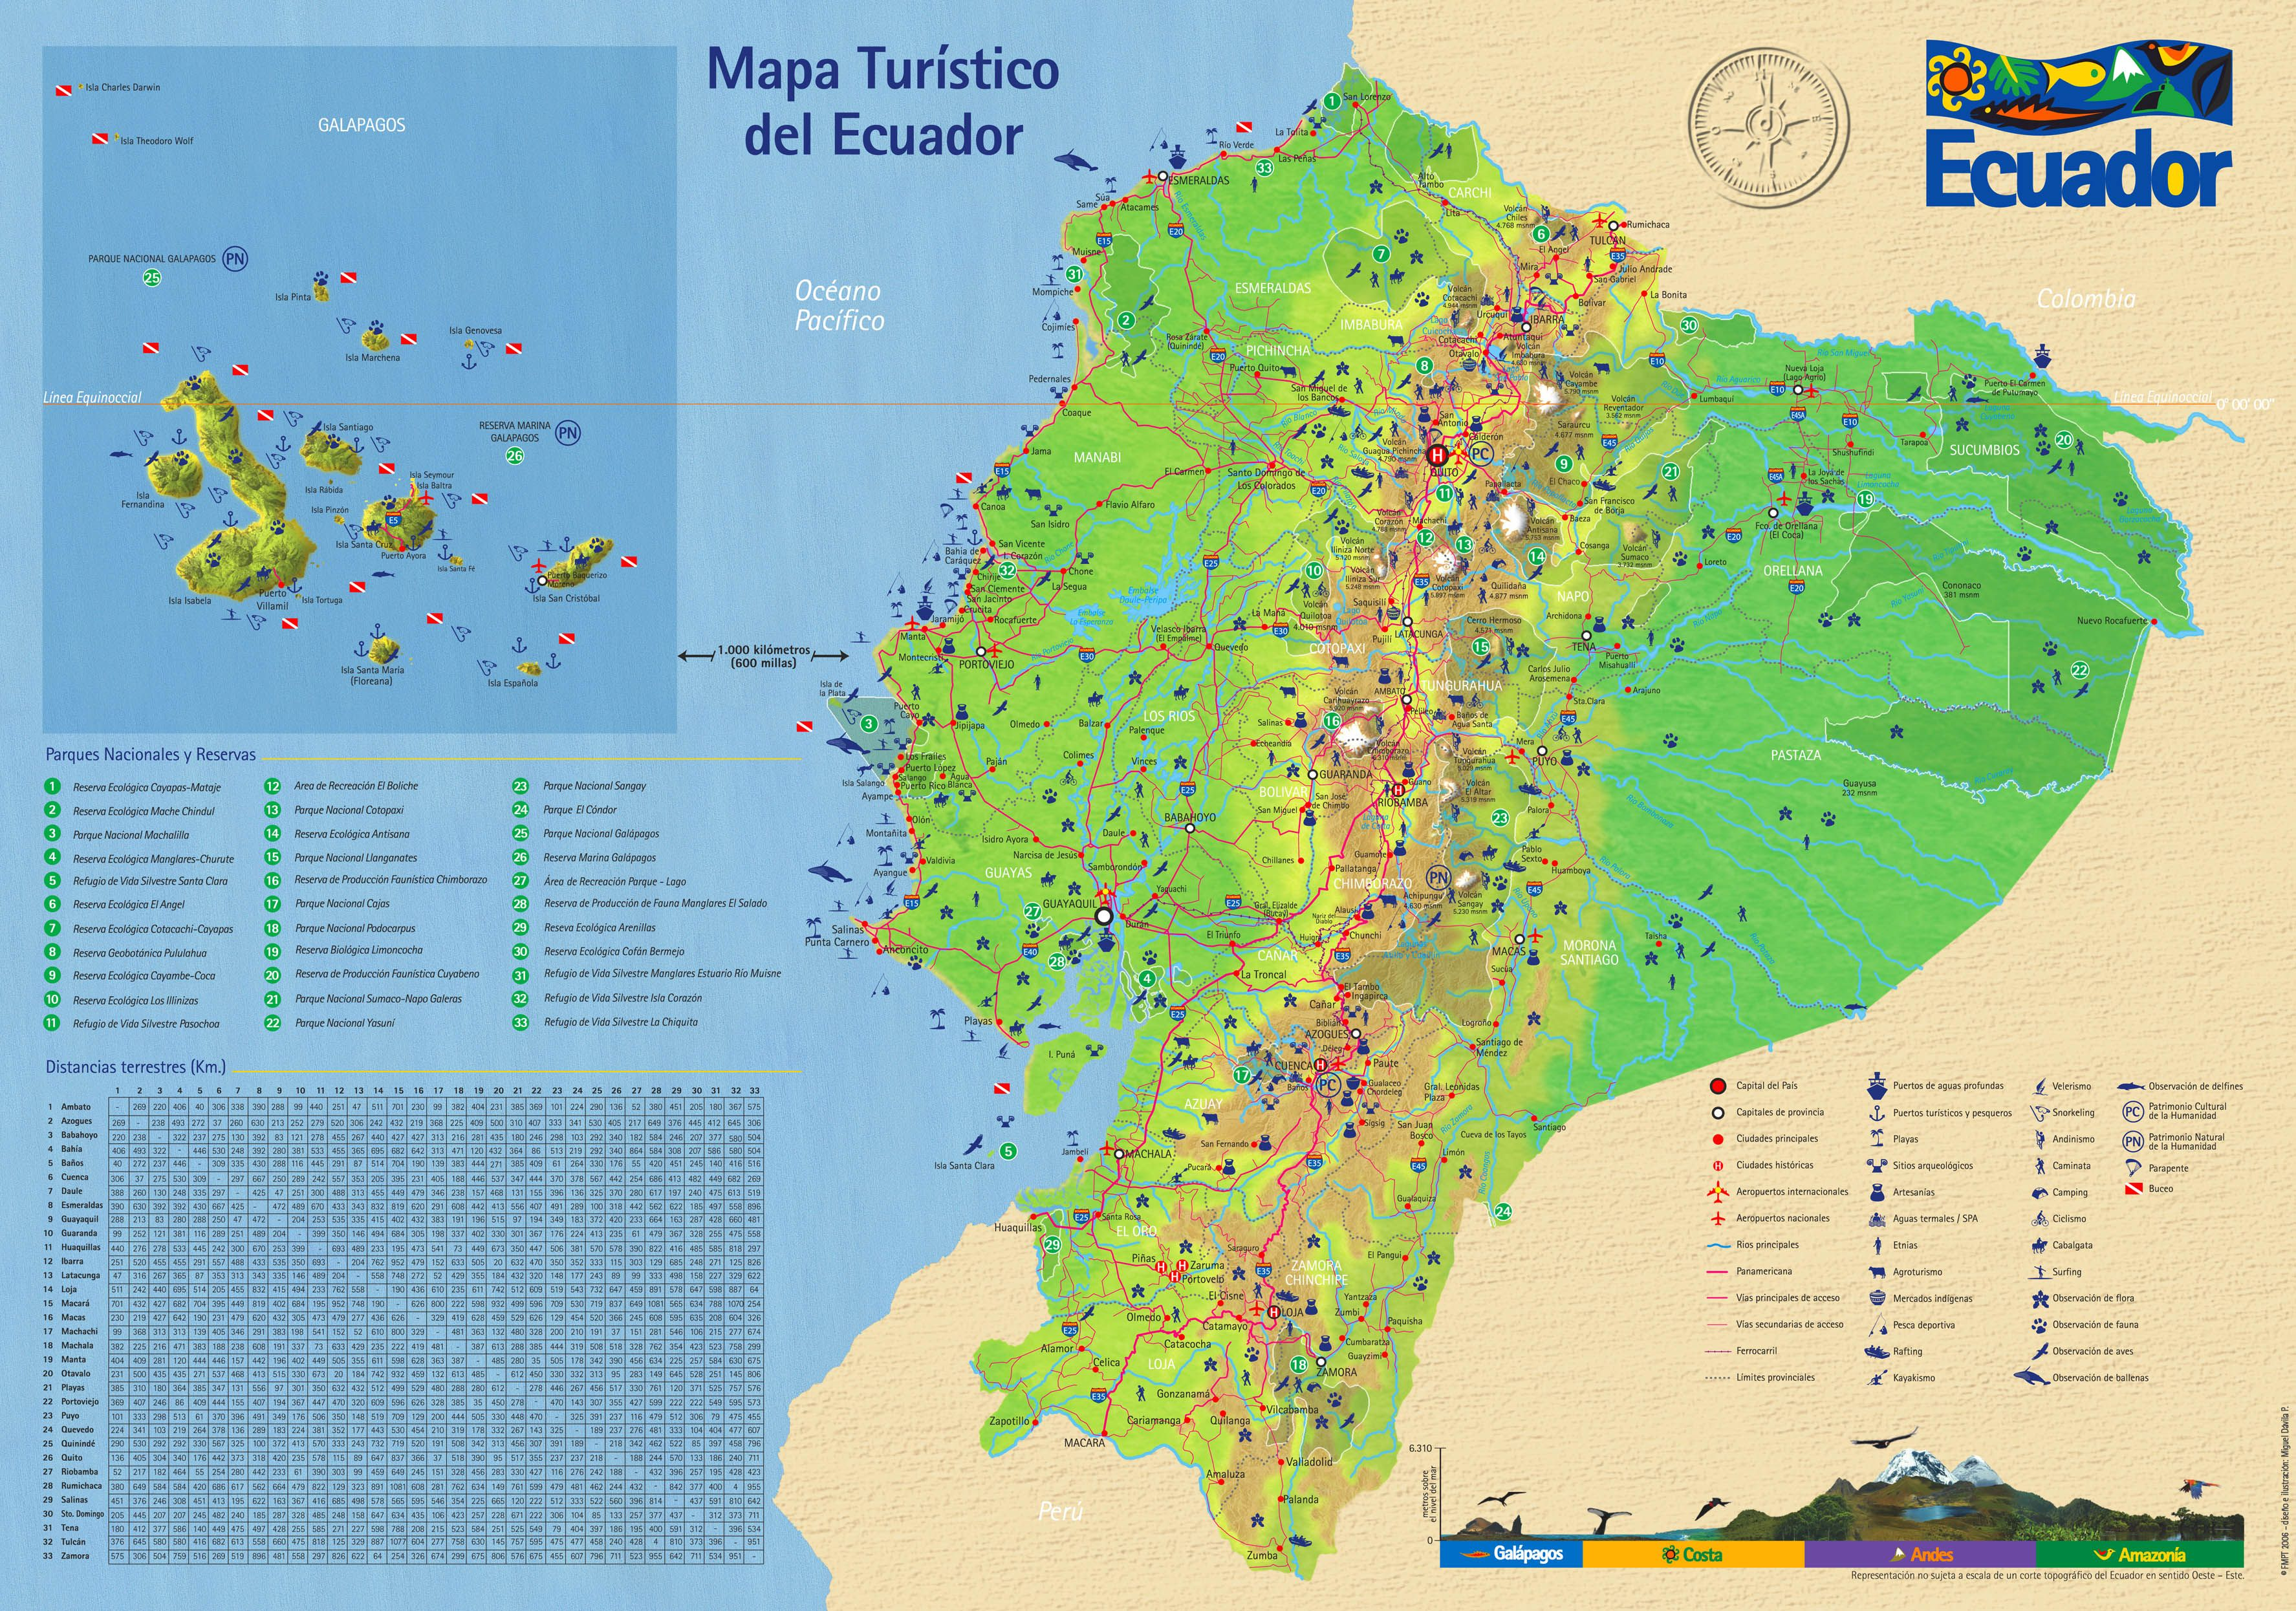 Mapa Turistico Ecuador Jpg 3 550 2 491 Pixels Mapa Turistico Equador Mapa